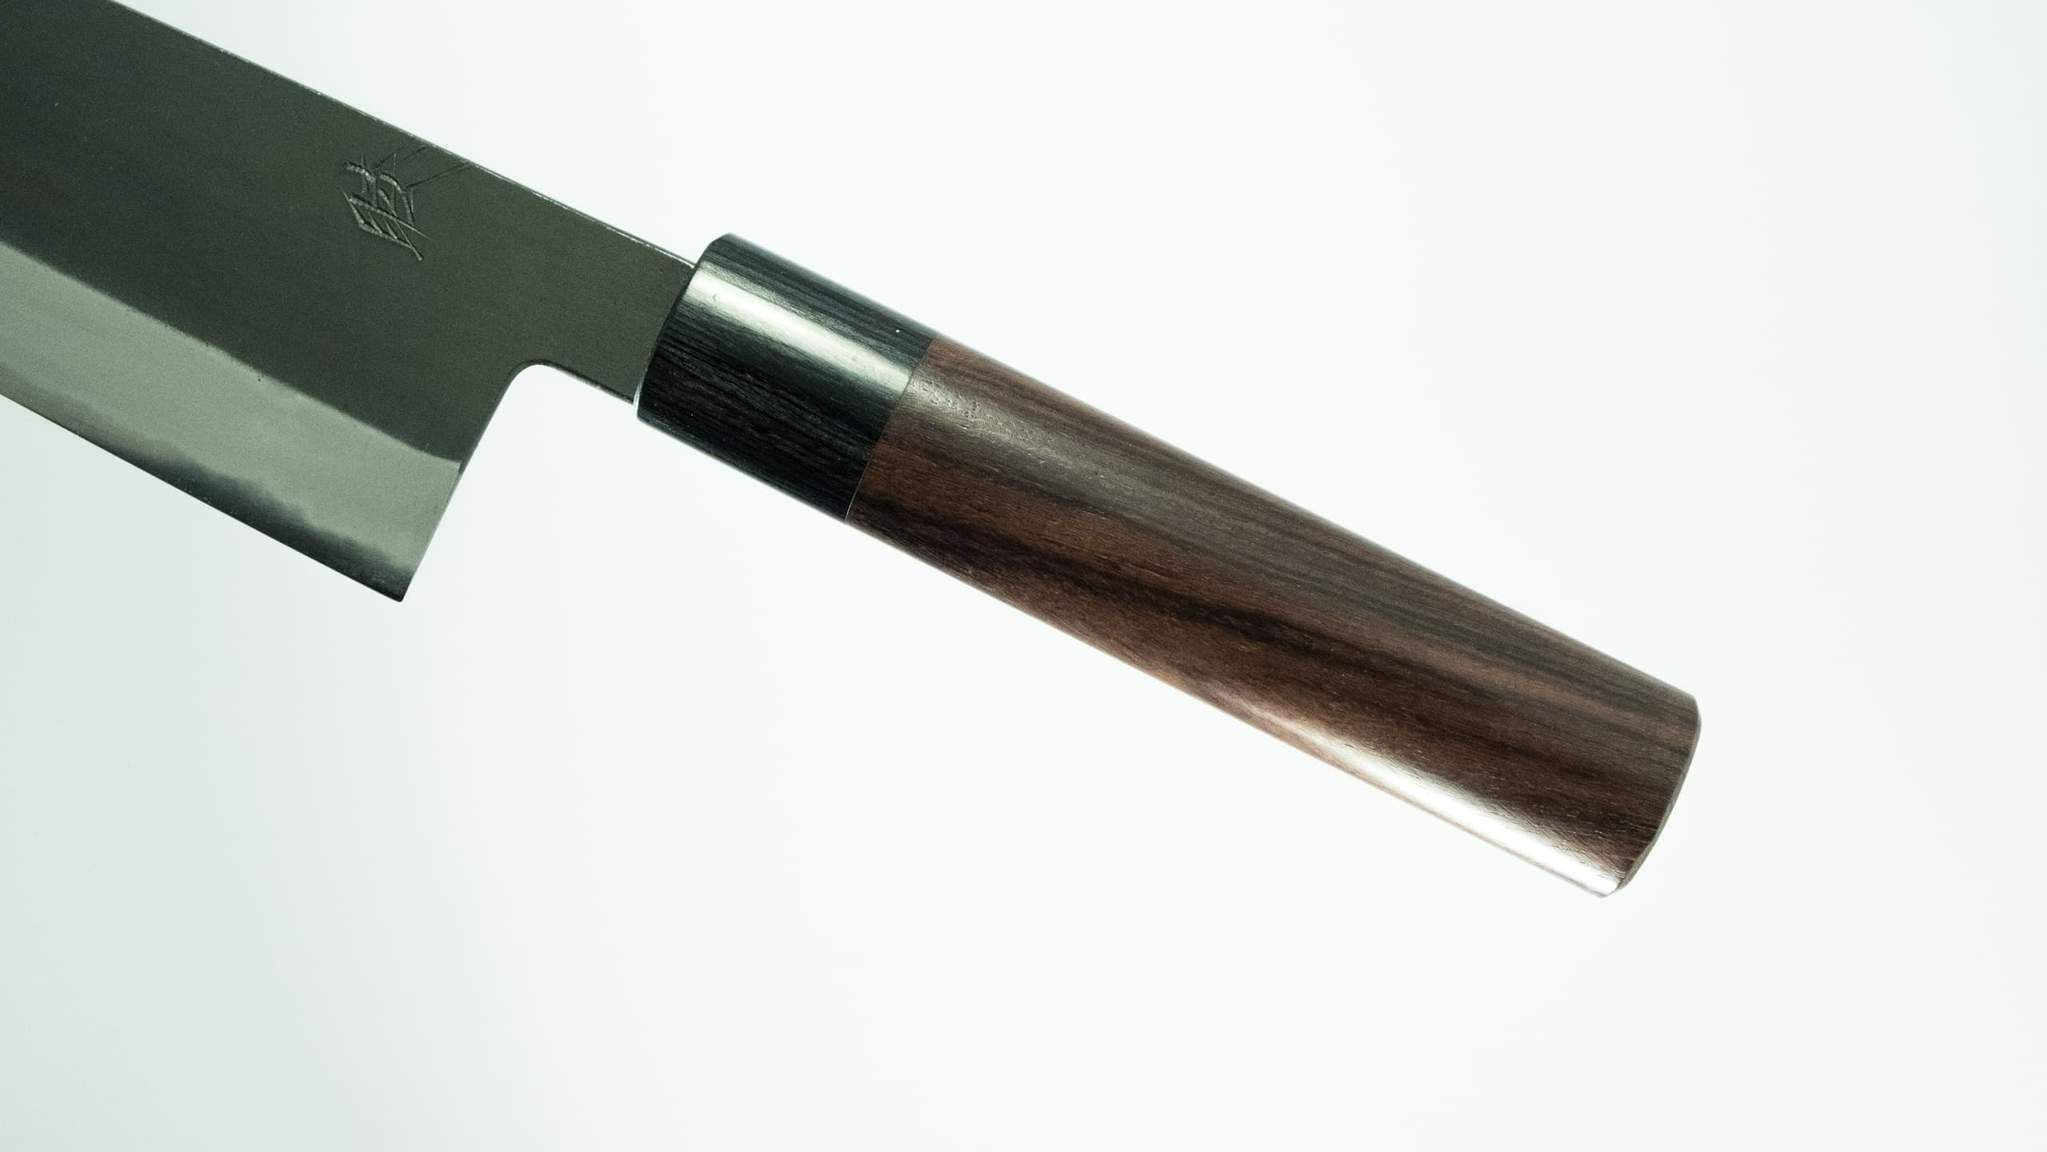 Mutsumi White White Steel 2 Wa-Gyuto 210mm Rosewood Handle japanese kitchen knife